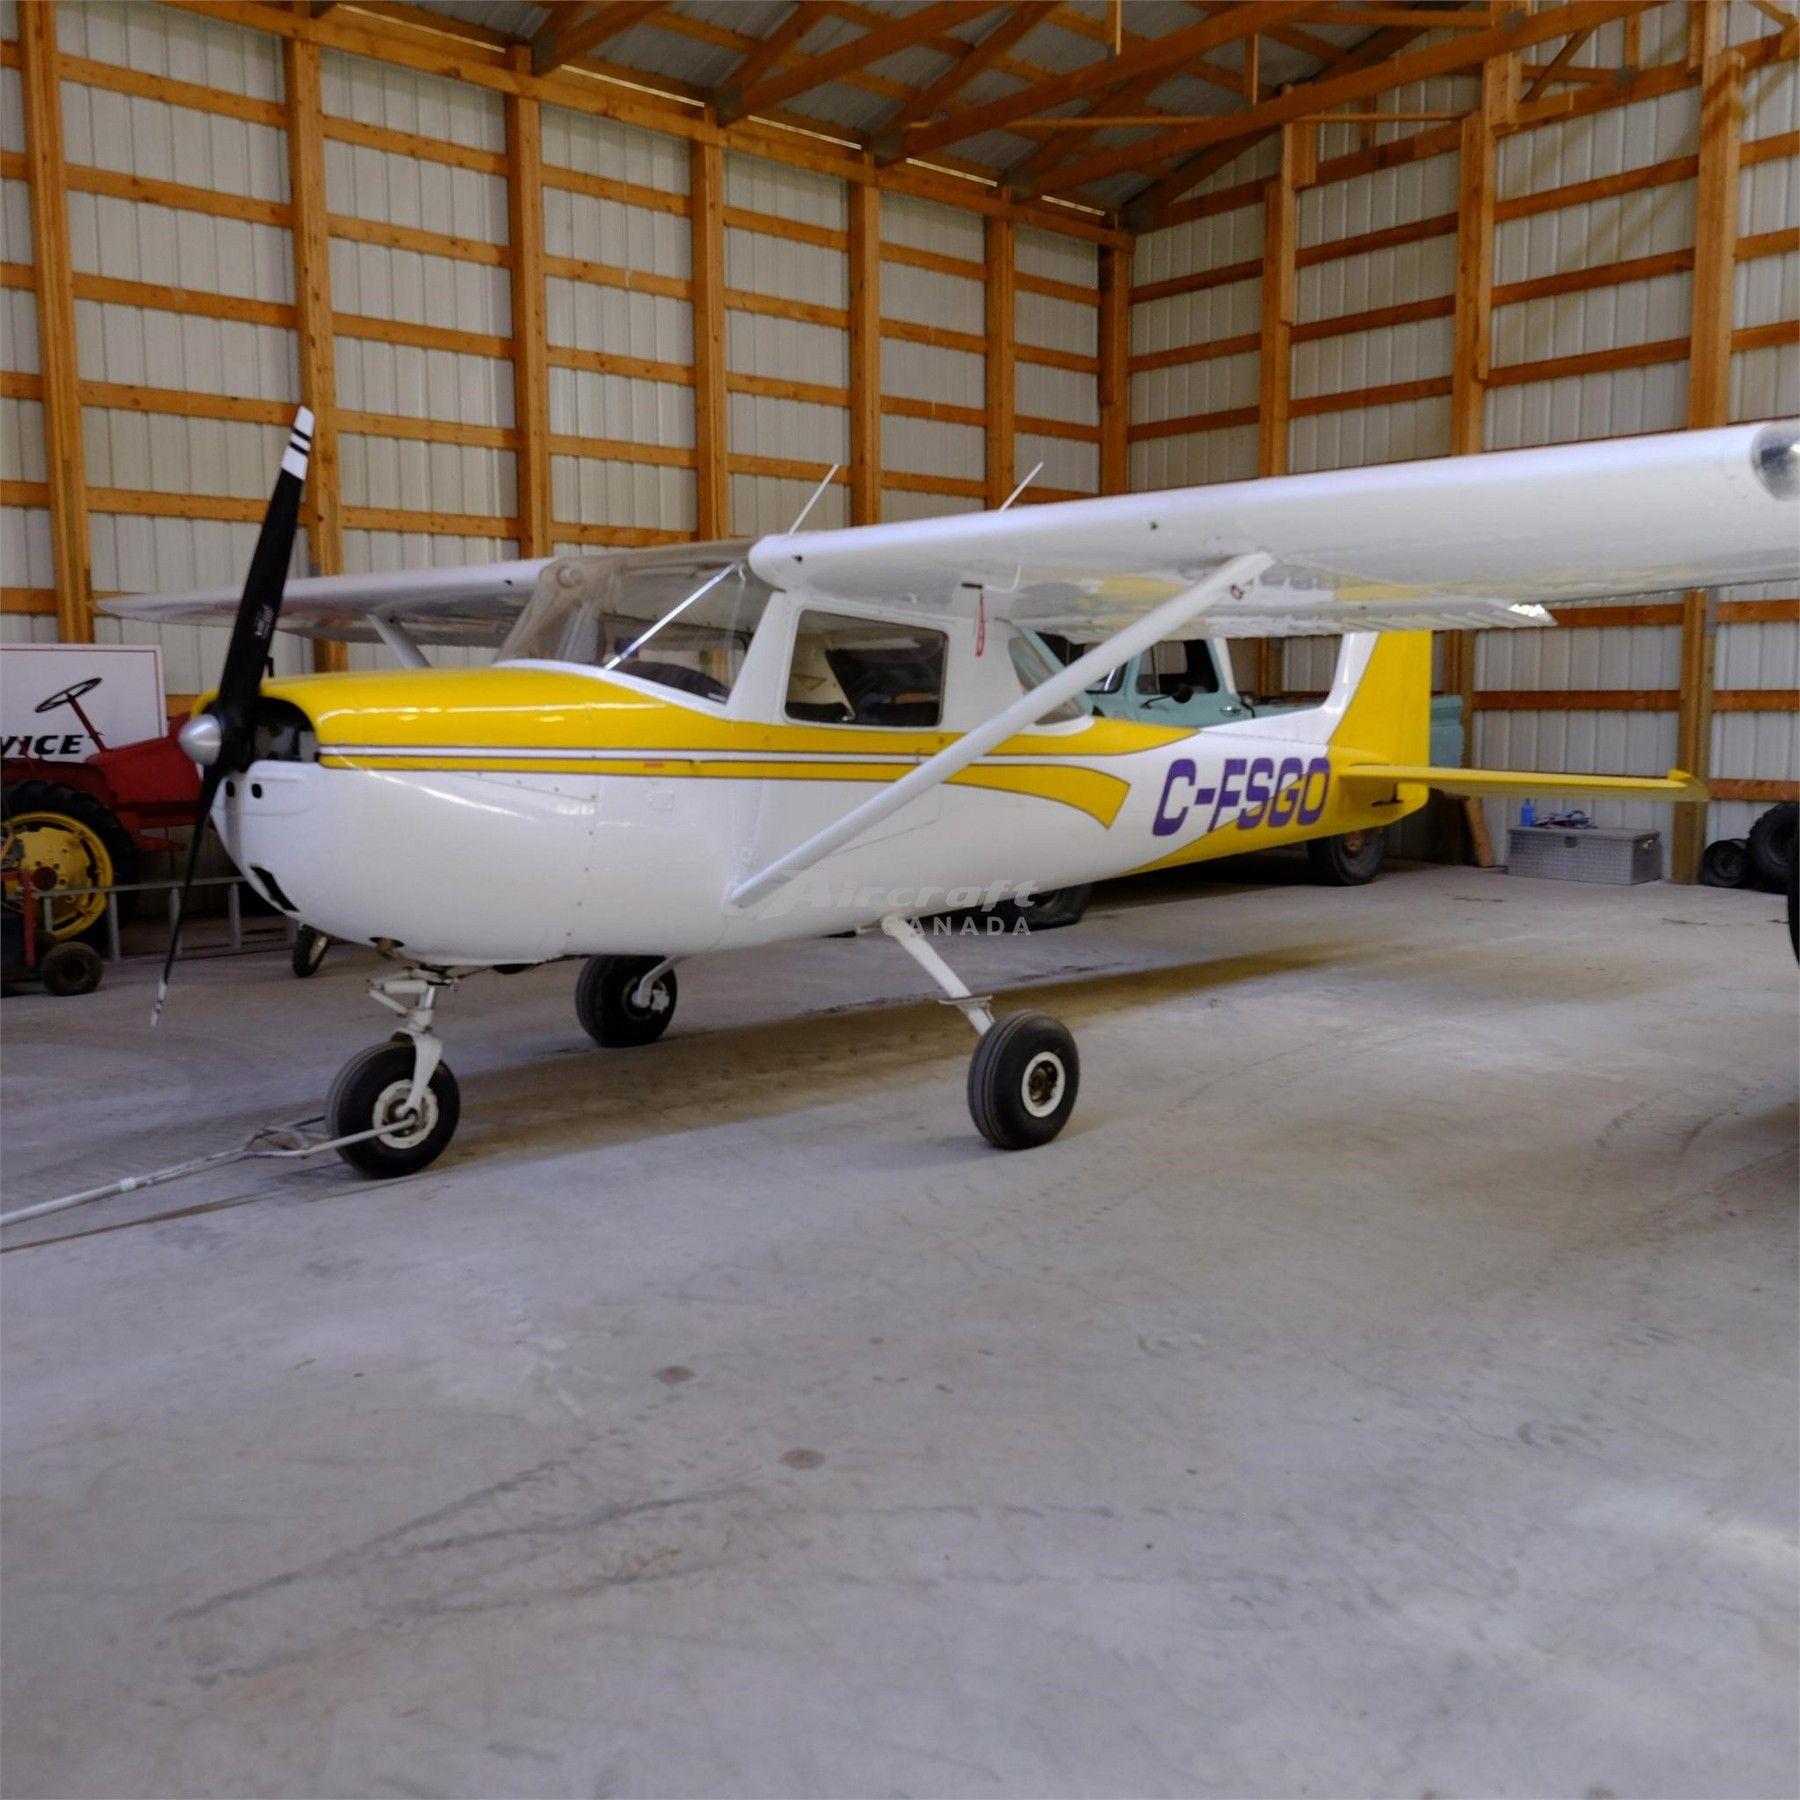 1965 Cessna 150 for sale in Arrowwood, AB Canada => www